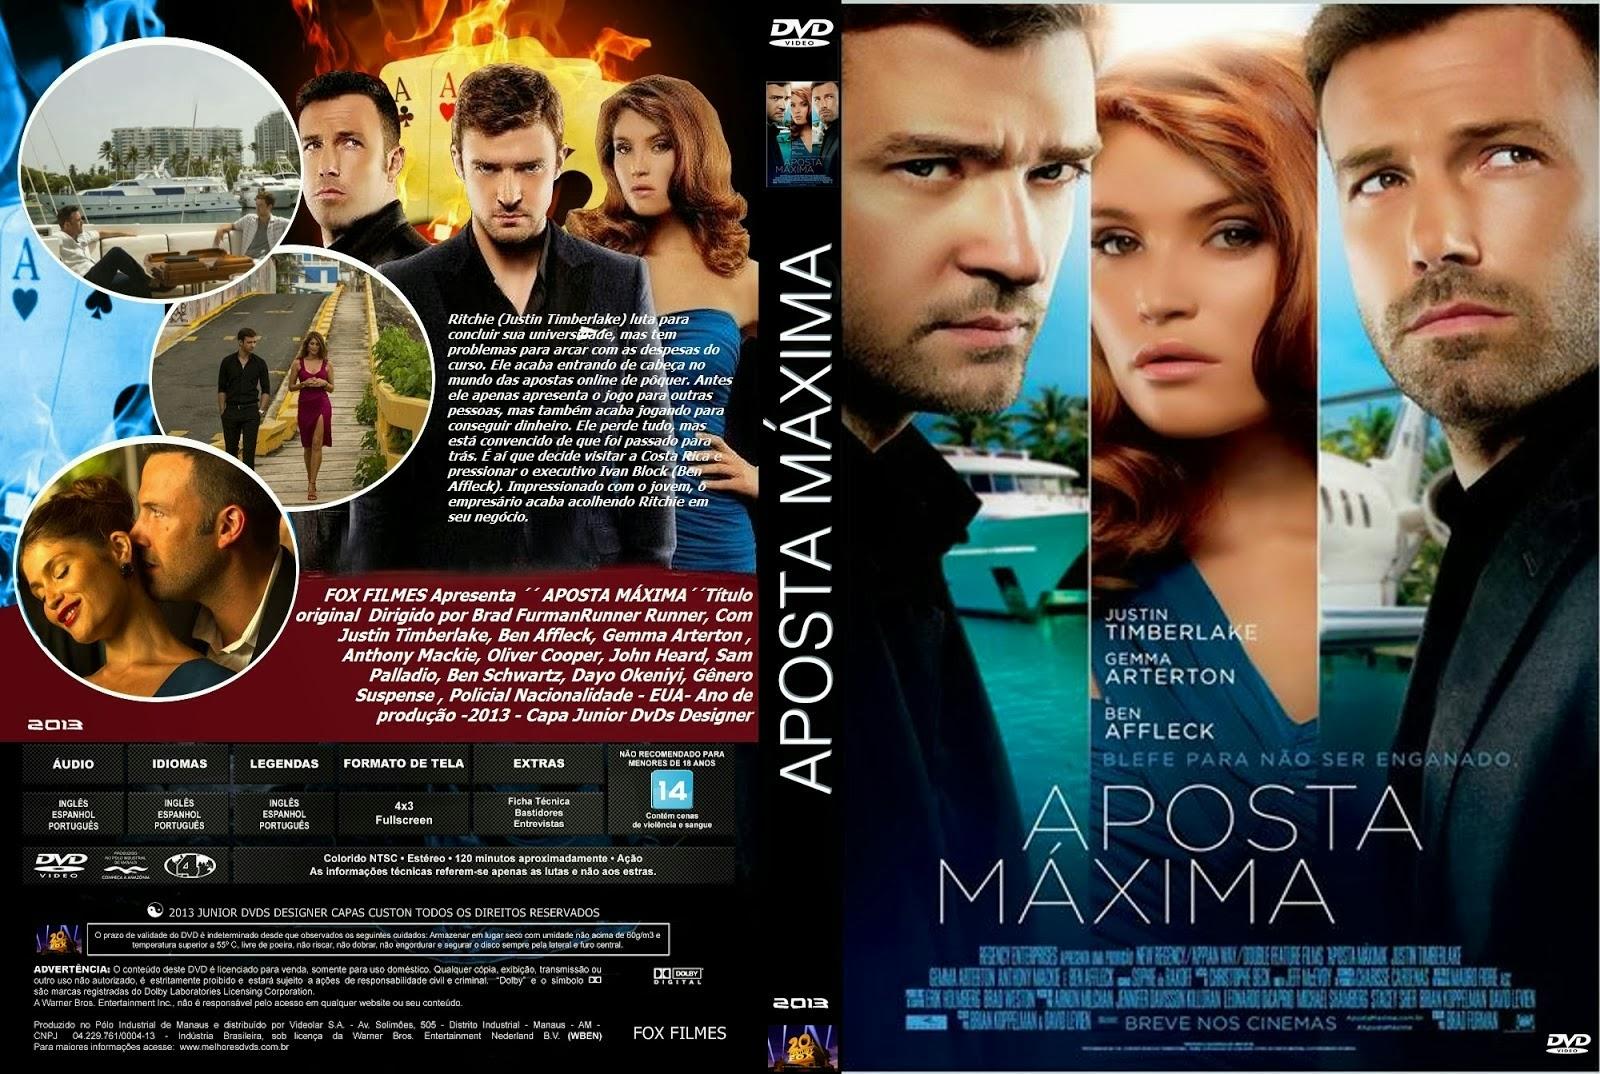 http://3.bp.blogspot.com/-G4zQ_Gi0qbI/UlM7-5sDBTI/AAAAAAAABlQ/hw3oPcZ44cs/s1600/APOSTA+MAXIMA++01.JPEG